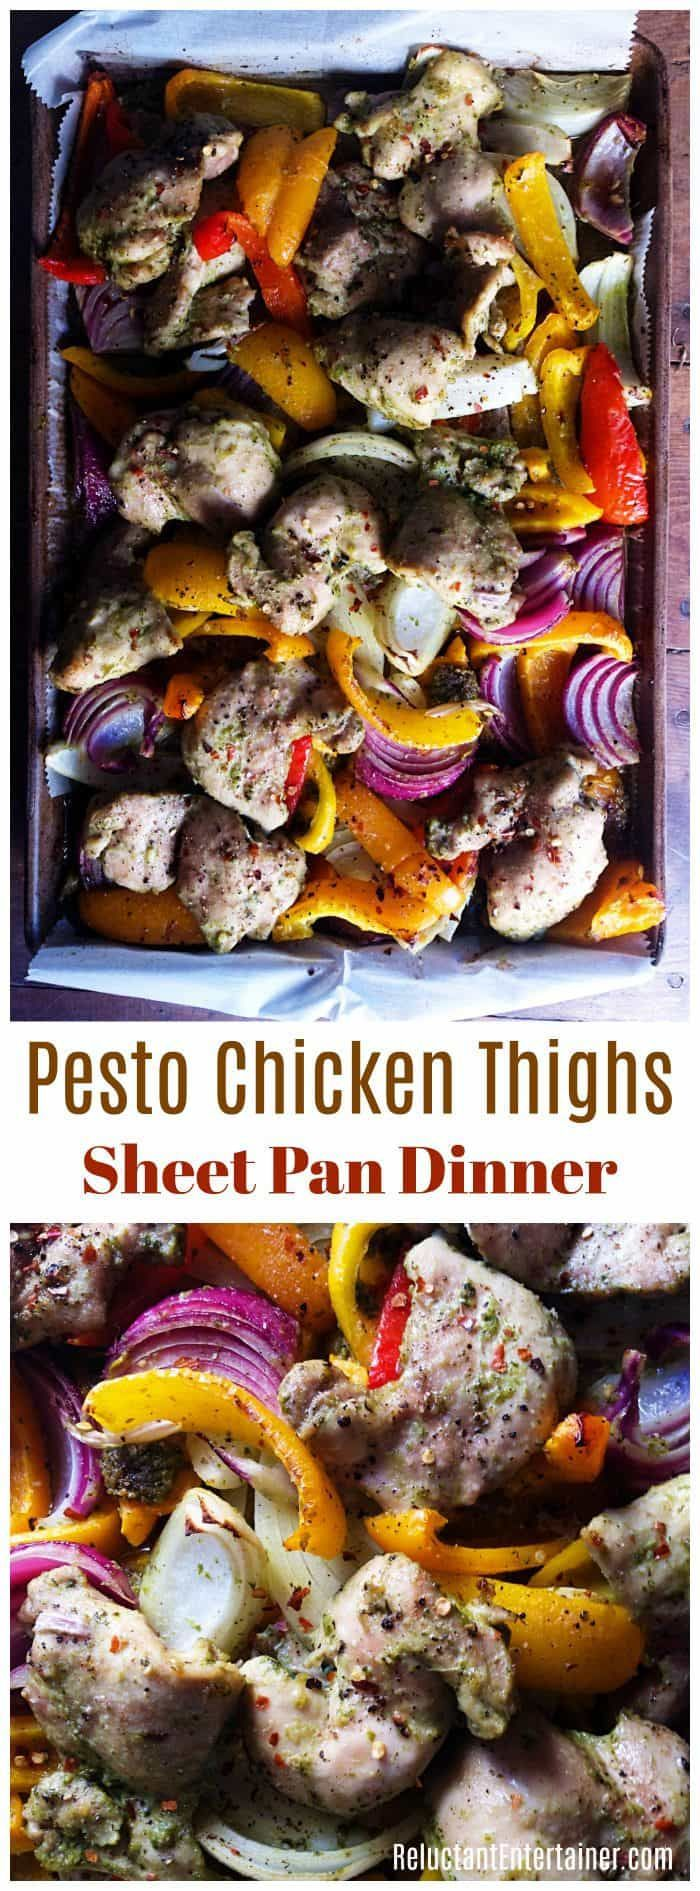 192 best sheet pan dinners images on pinterest cooking recipes pesto chicken thighs sheet pan dinner pesto chickenchicken mealschicken forumfinder Choice Image